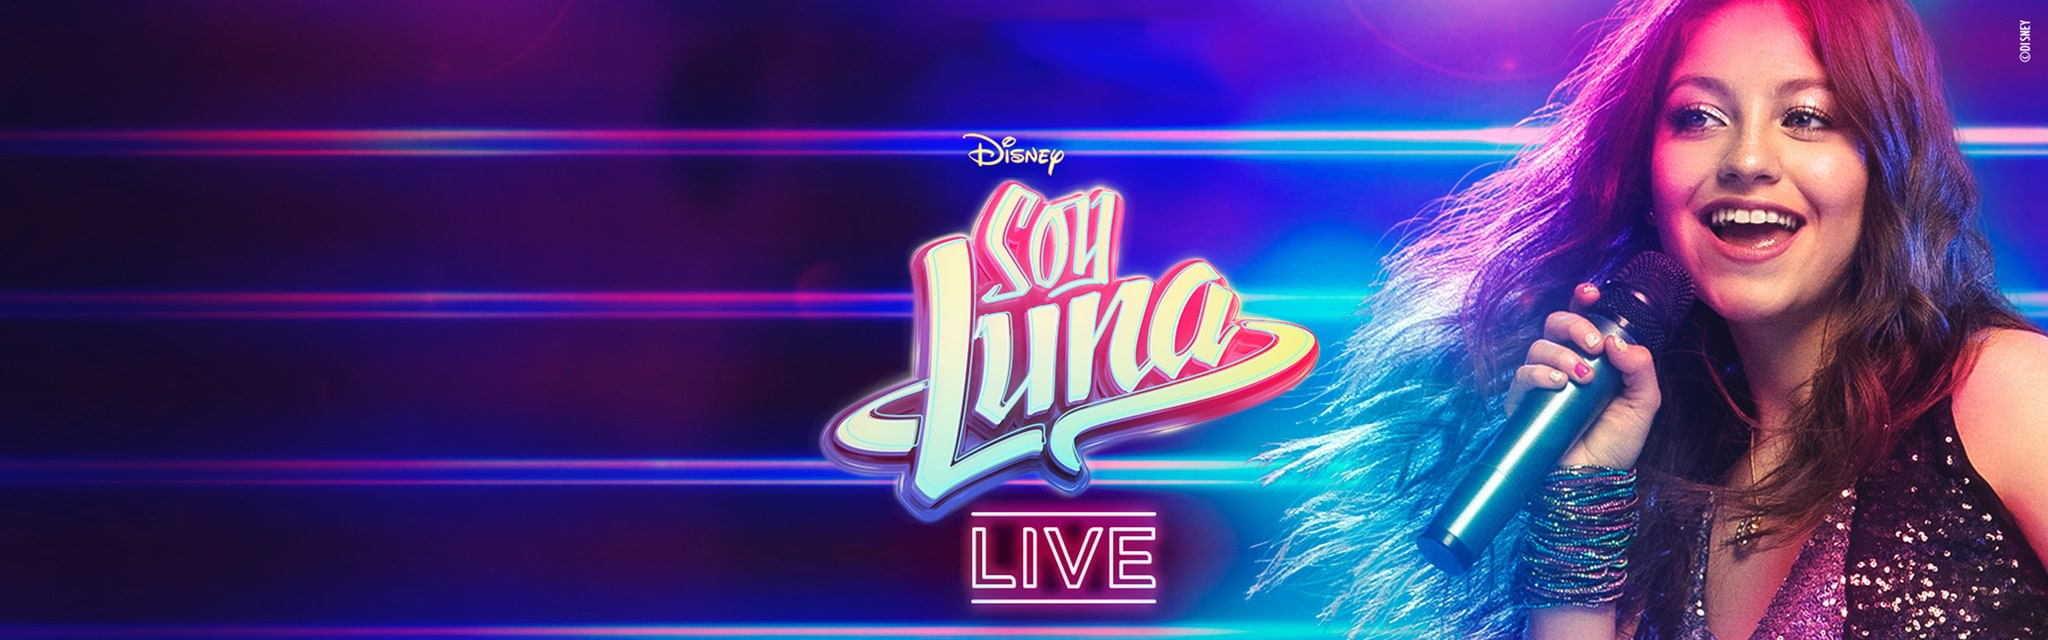 Soy Luna Live (hero promo)